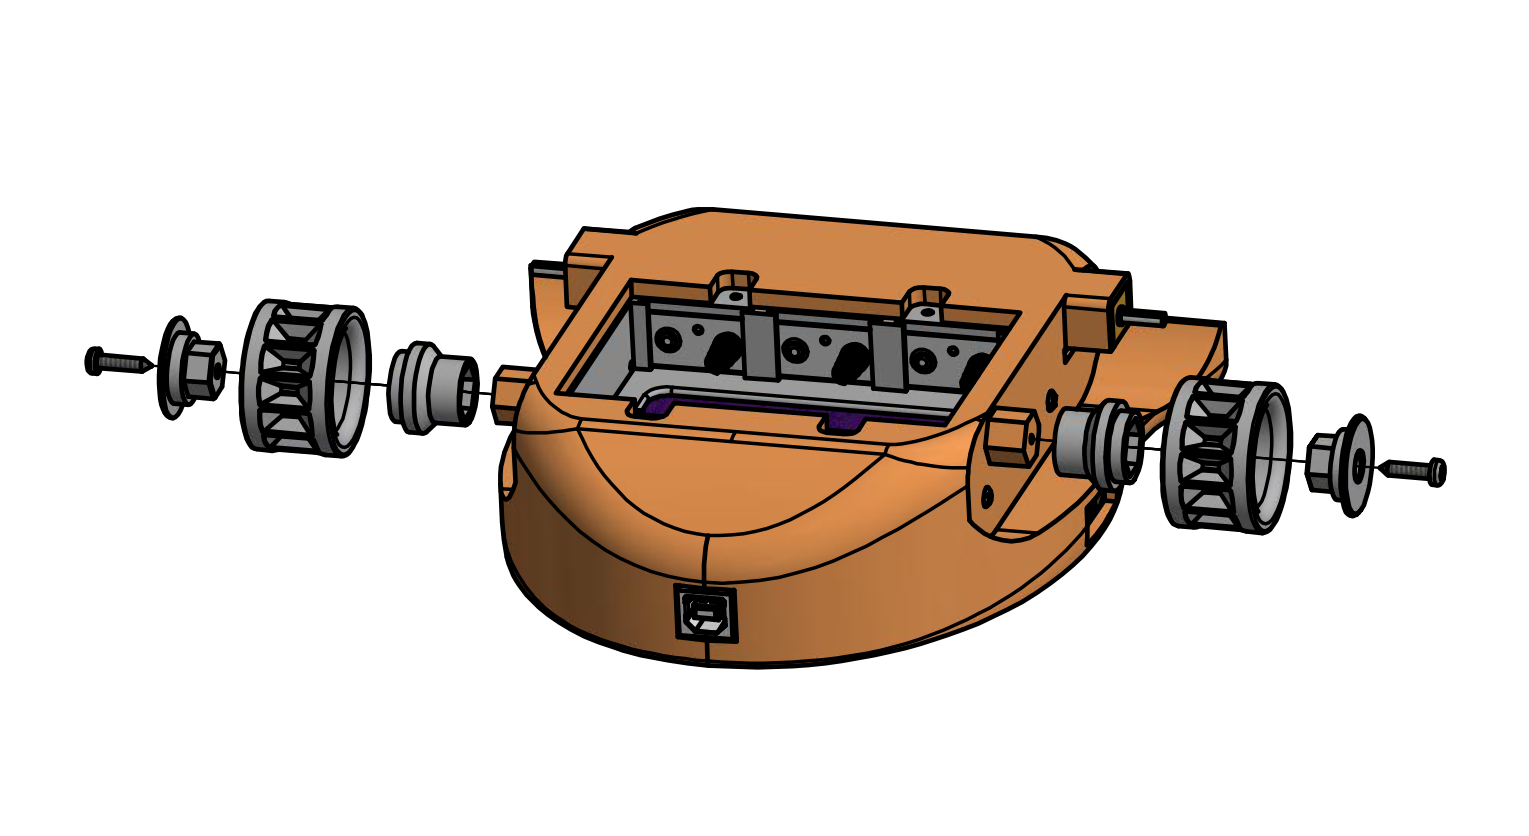 Install the idler wheels